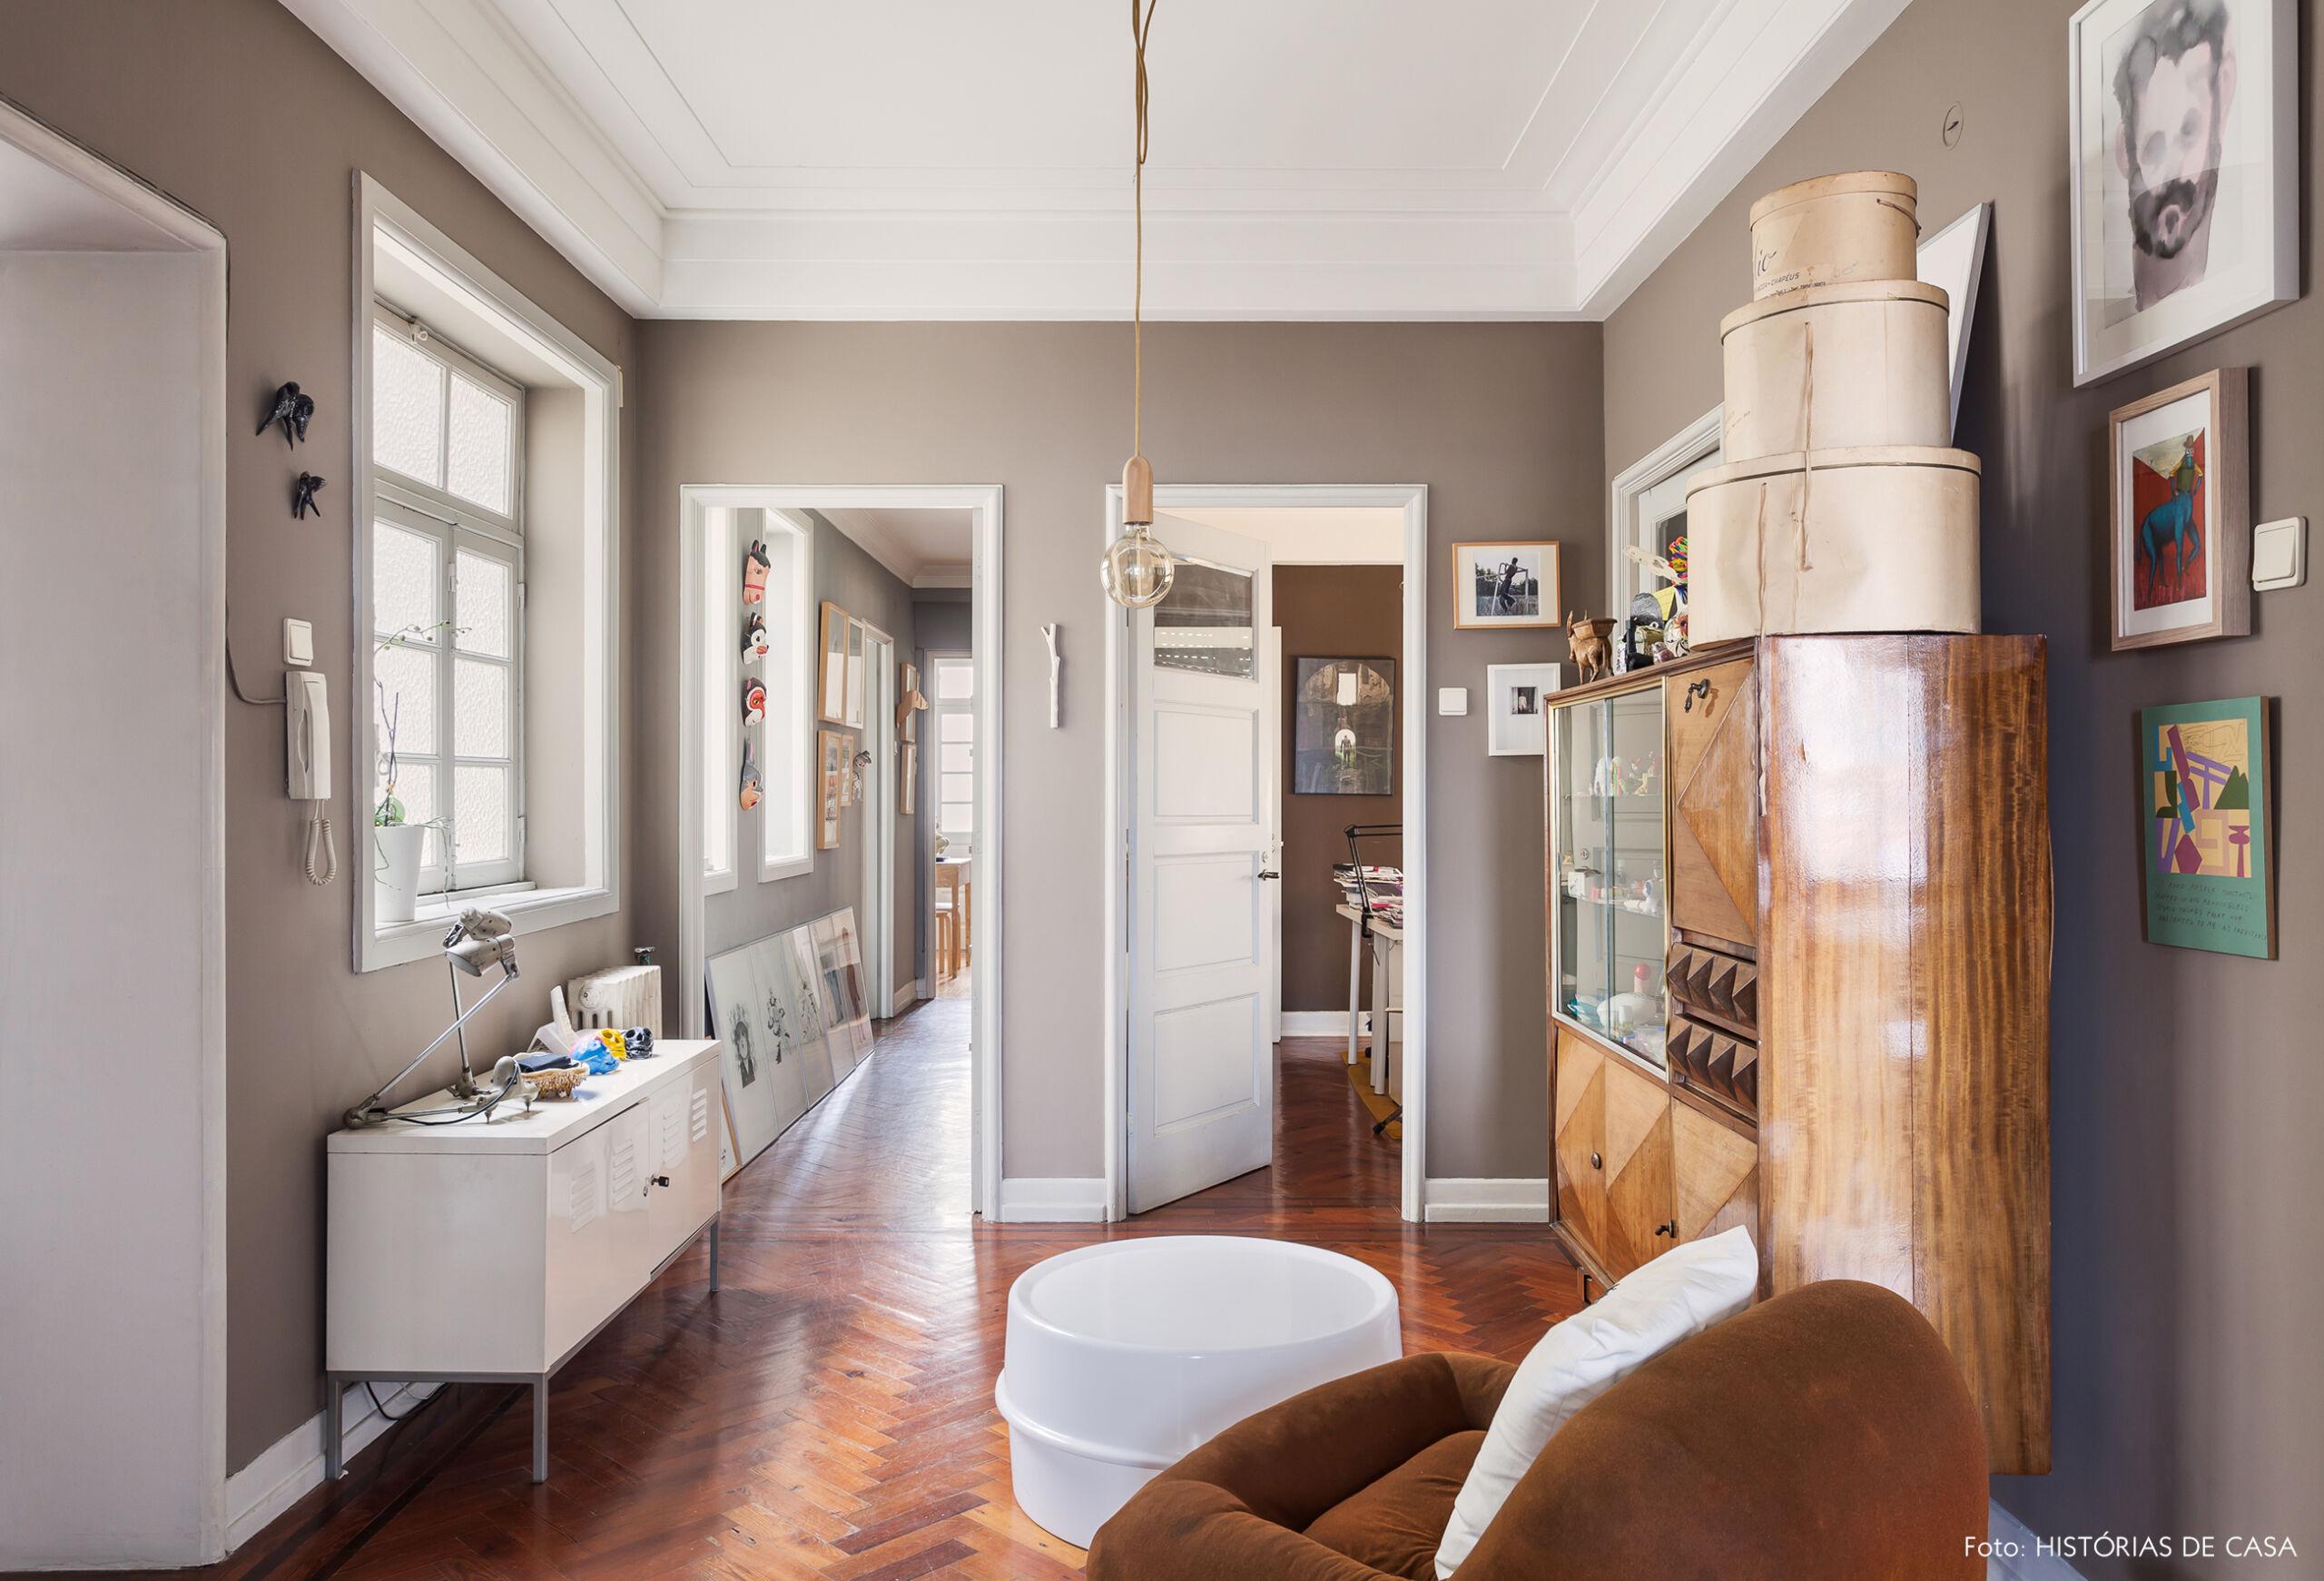 Sala de entrada com paredes pintadas de cinza